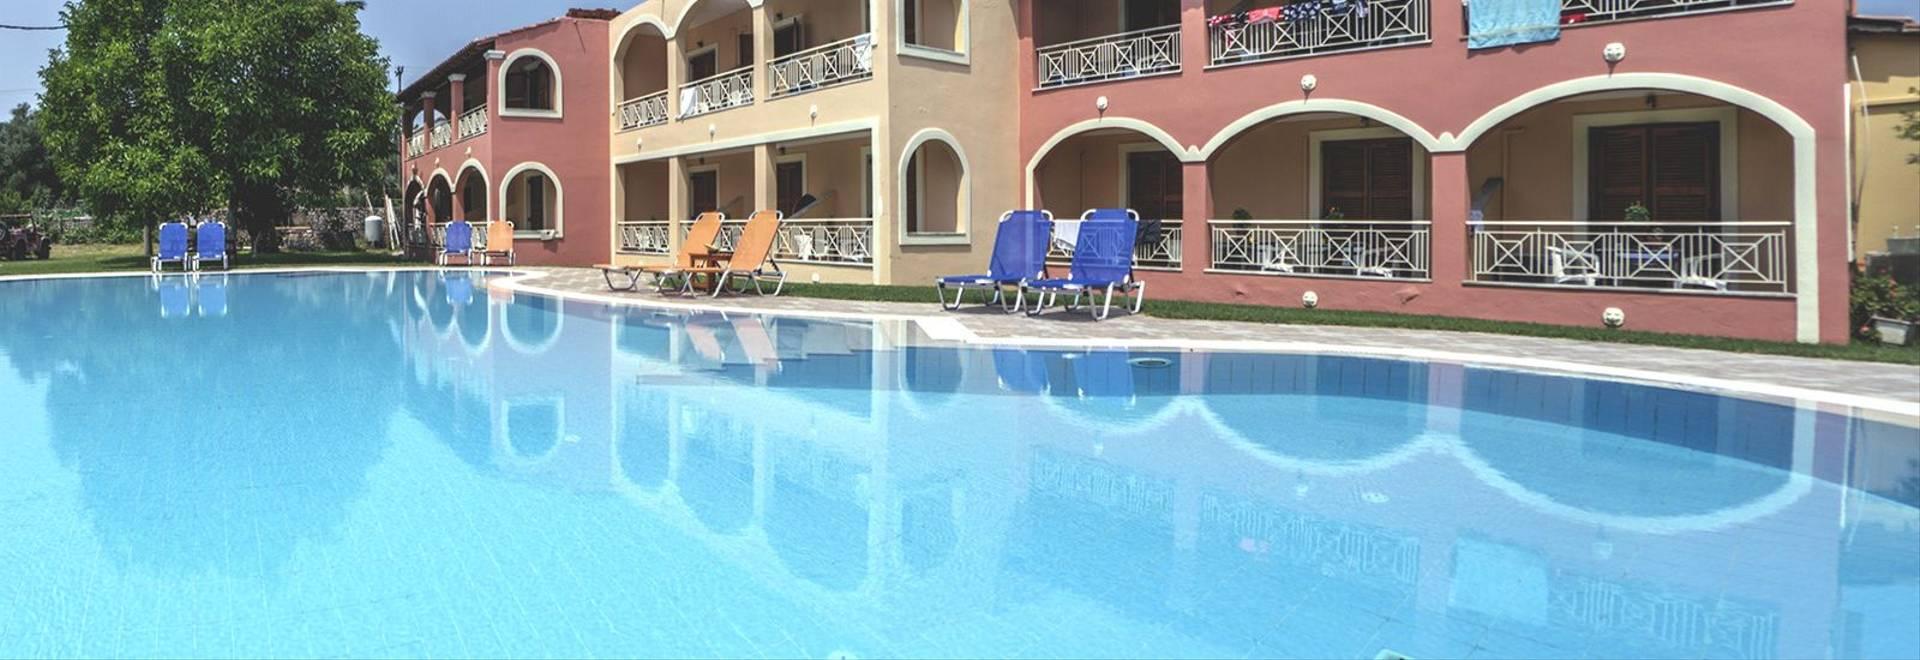 Aronda Large Pool